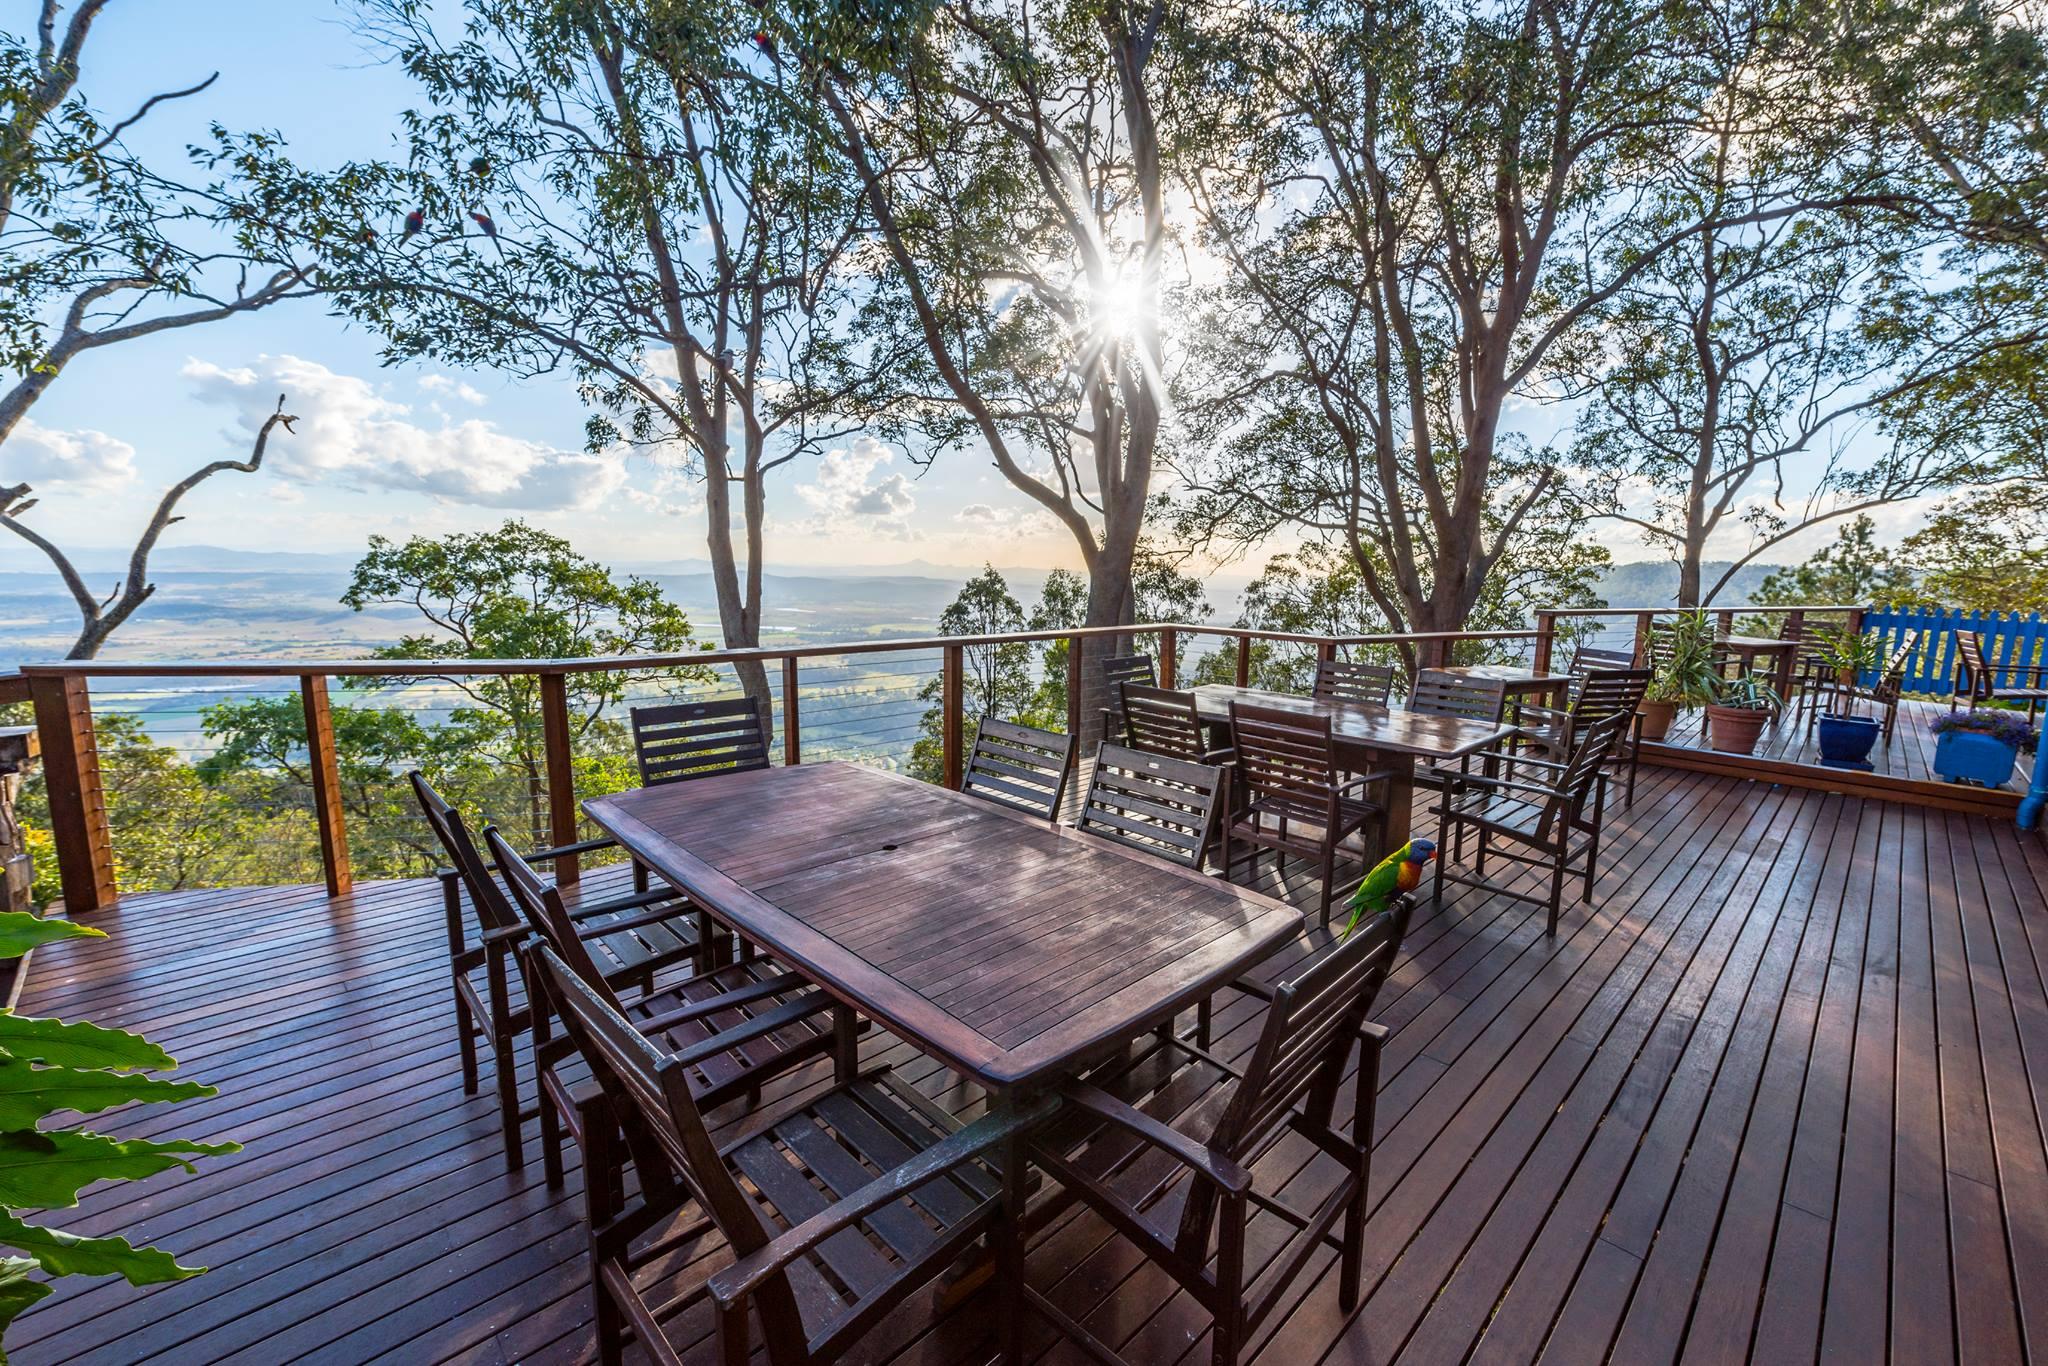 polish cafe deck